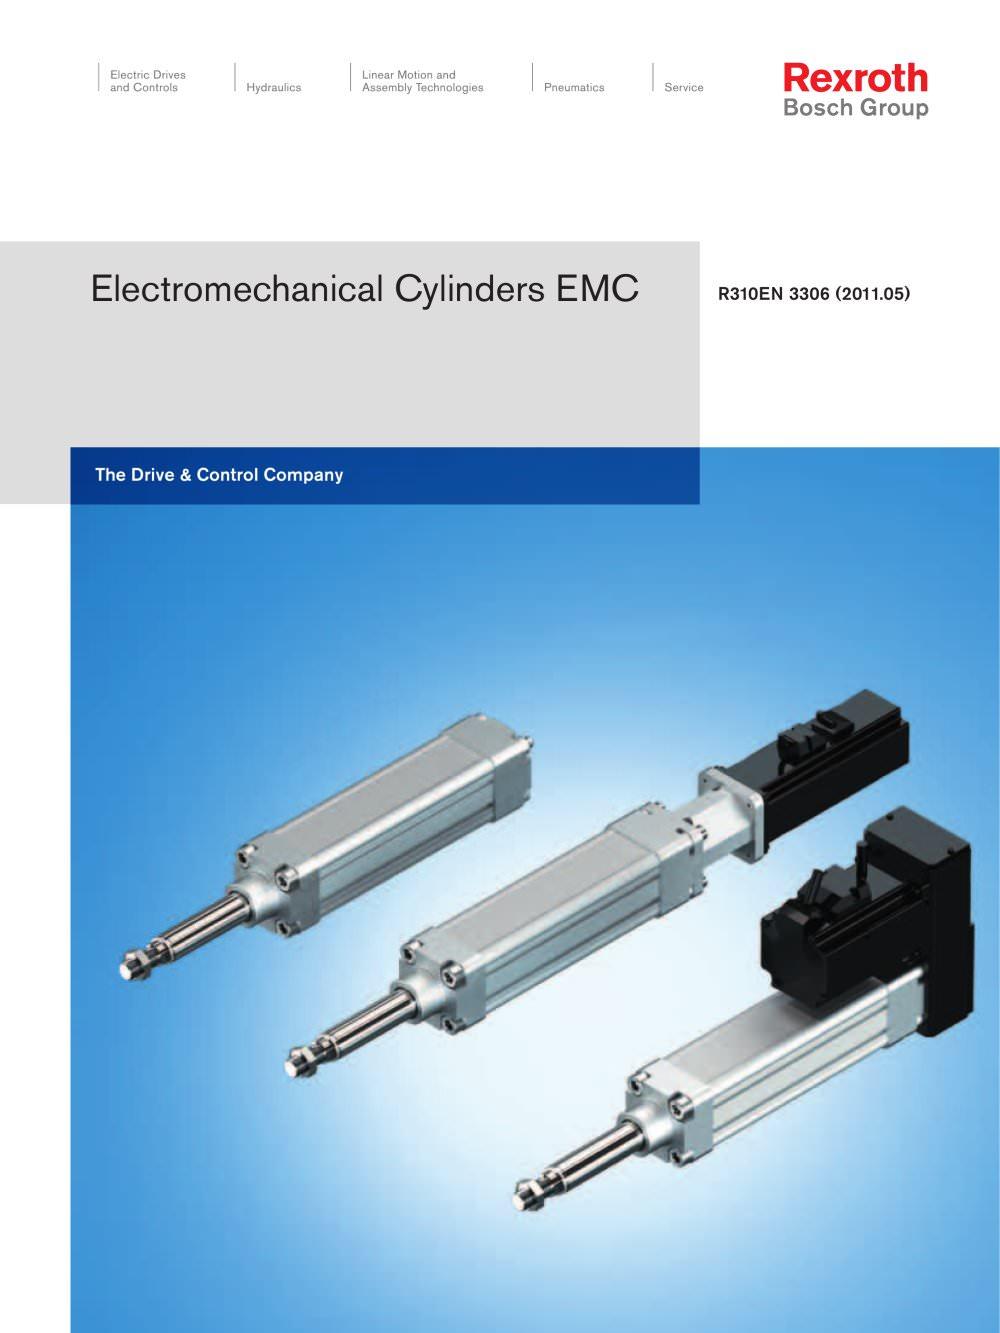 emc tools